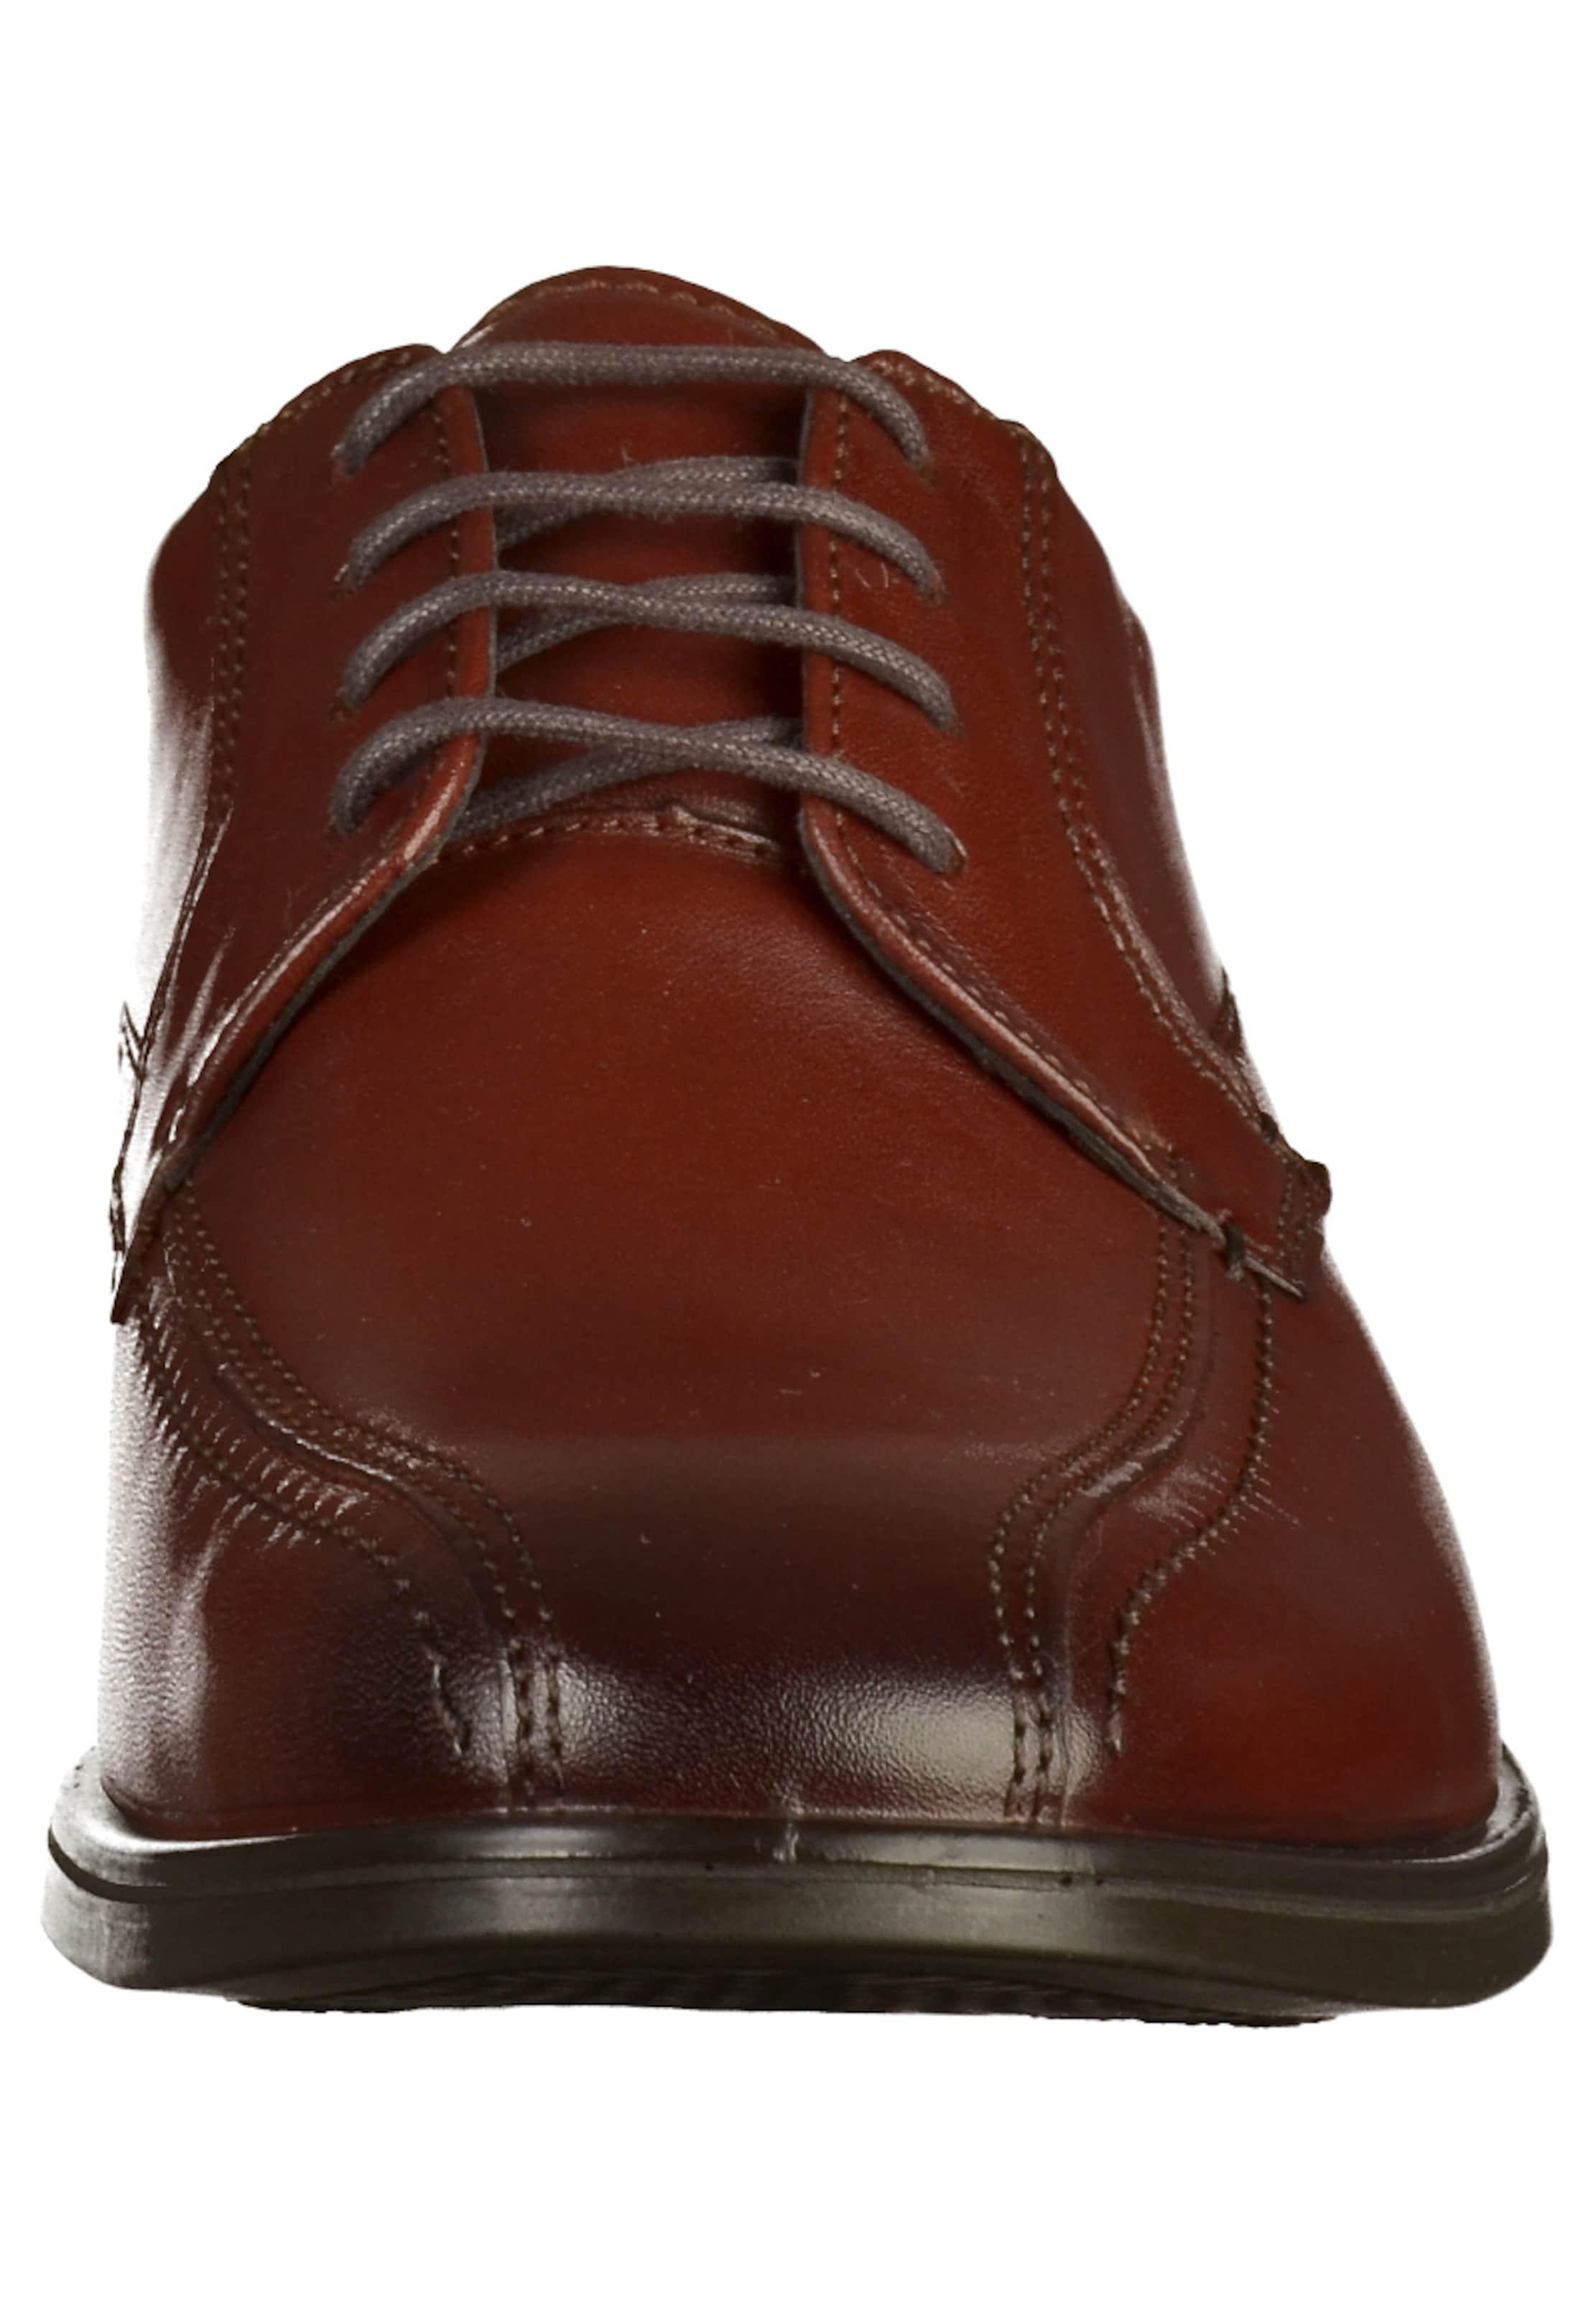 ECCO Businessschuhe Leder Bequem, gut aussehend aussehend aussehend 878561